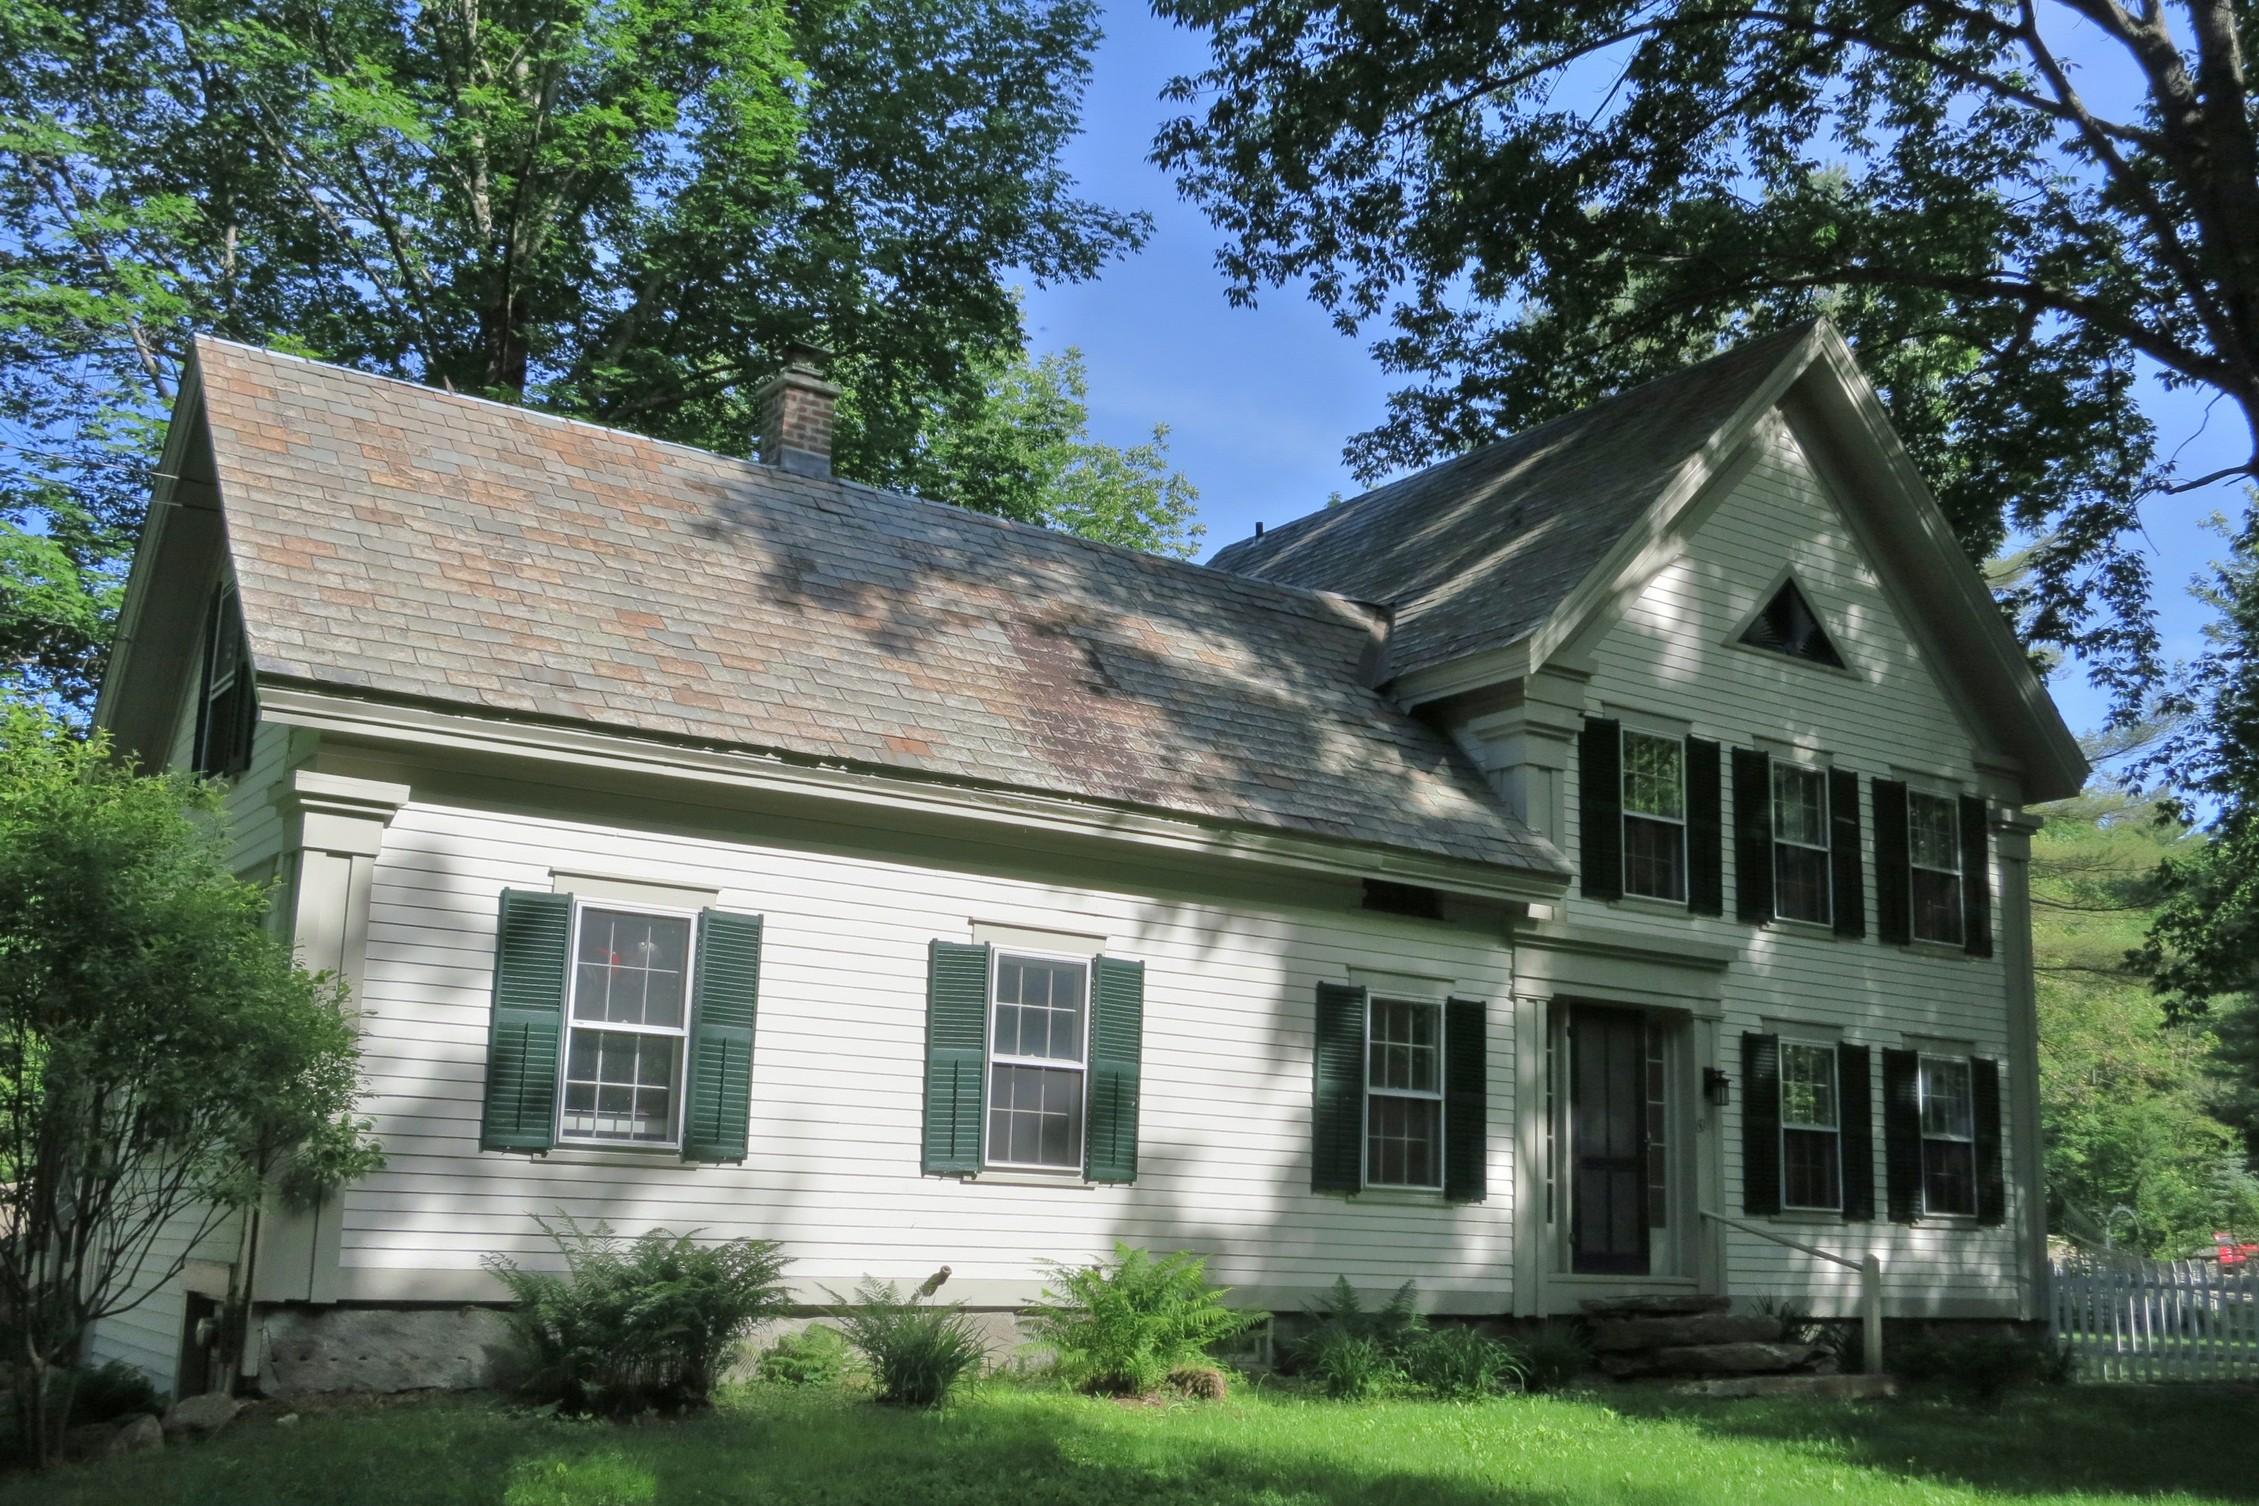 Nhà ở một gia đình vì Bán tại 69 Castle Hill Road, Jamaica 69 Castle Hill Rd Jamaica, Vermont, 05343 Hoa Kỳ